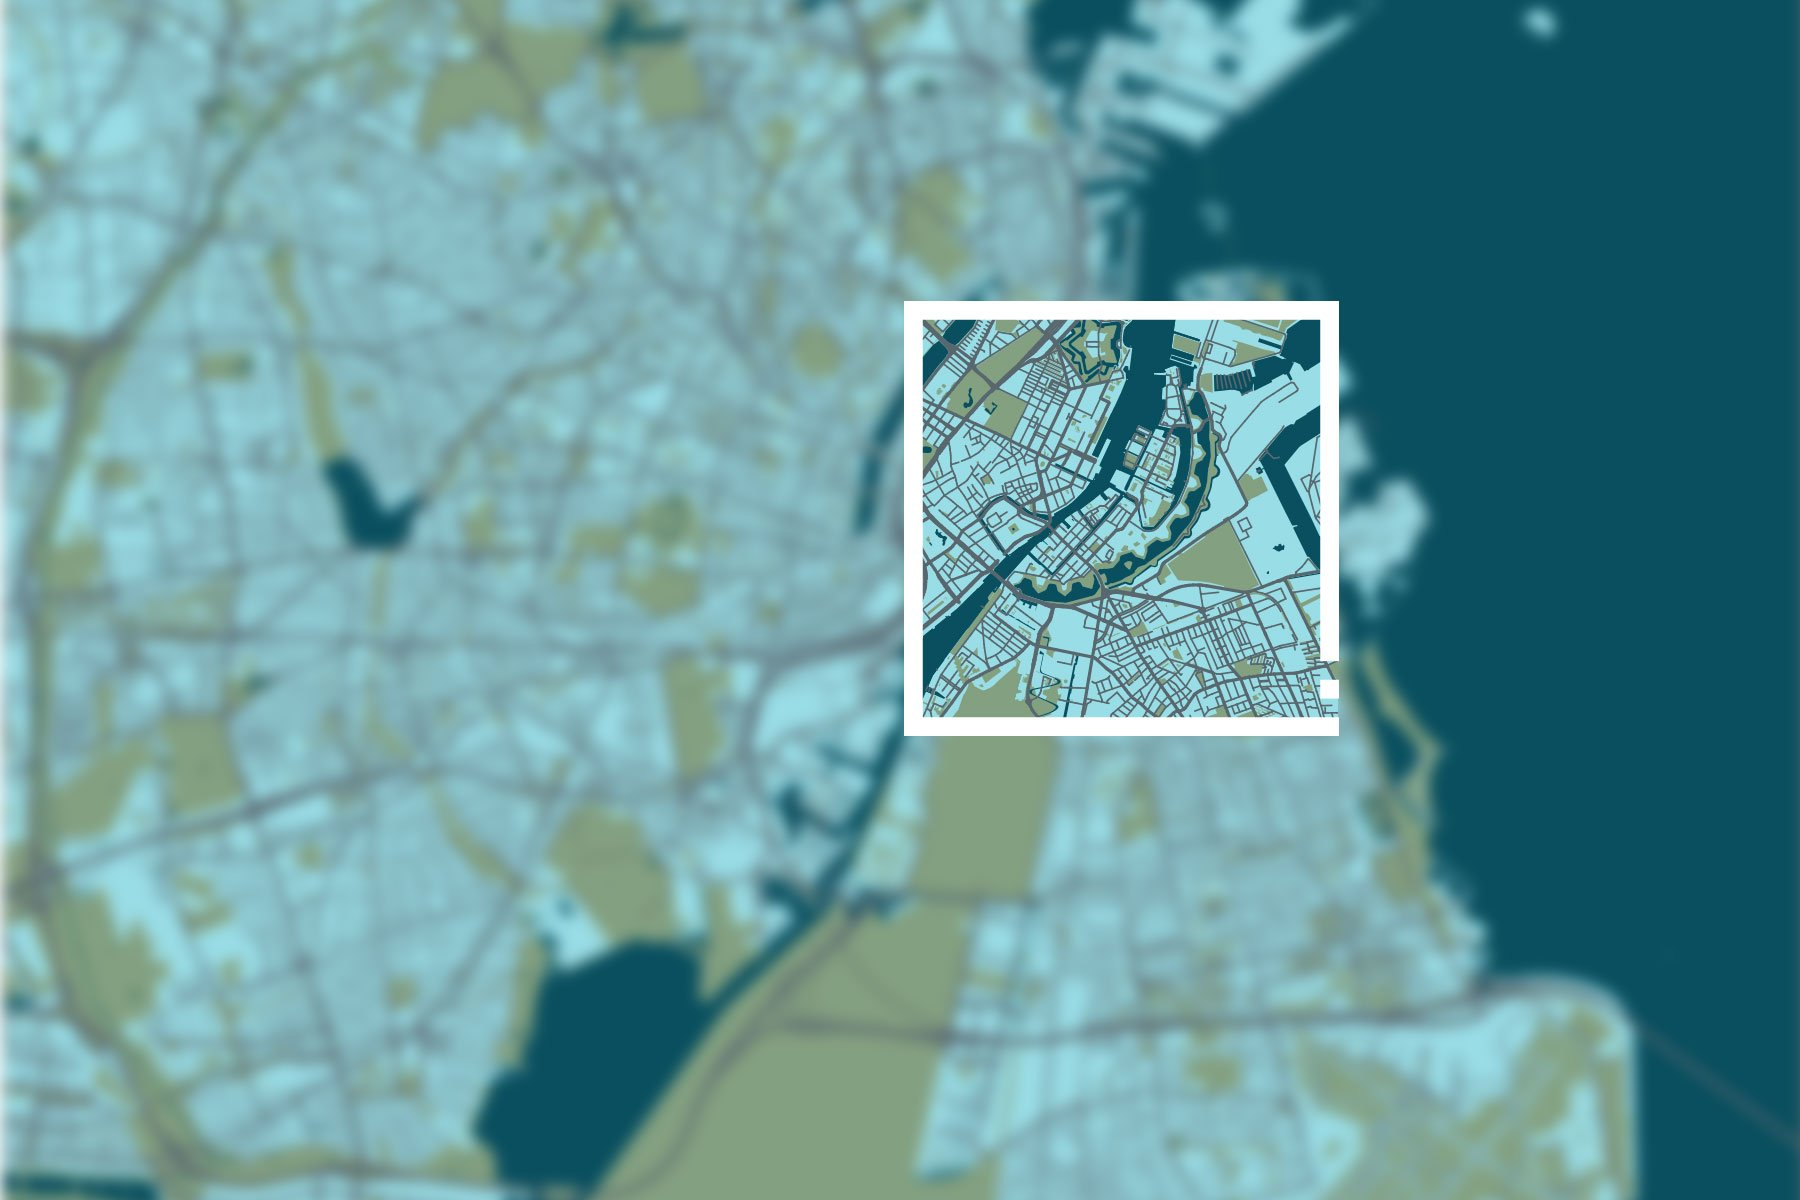 web_landing_location-mdm_shutterstock_1189904743-_Converted_